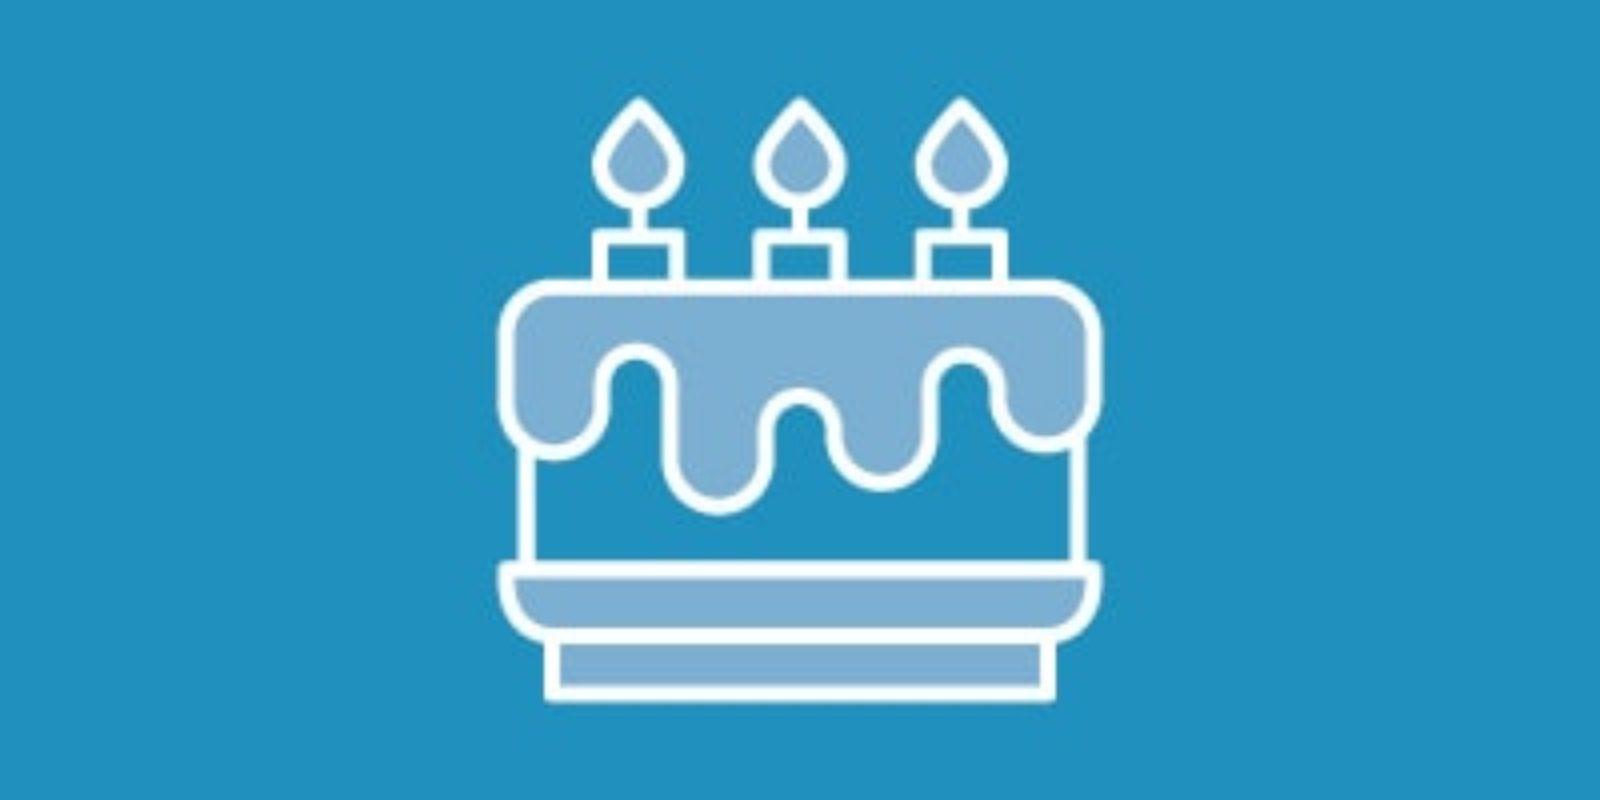 Kat-Icon-Geburtstag_w